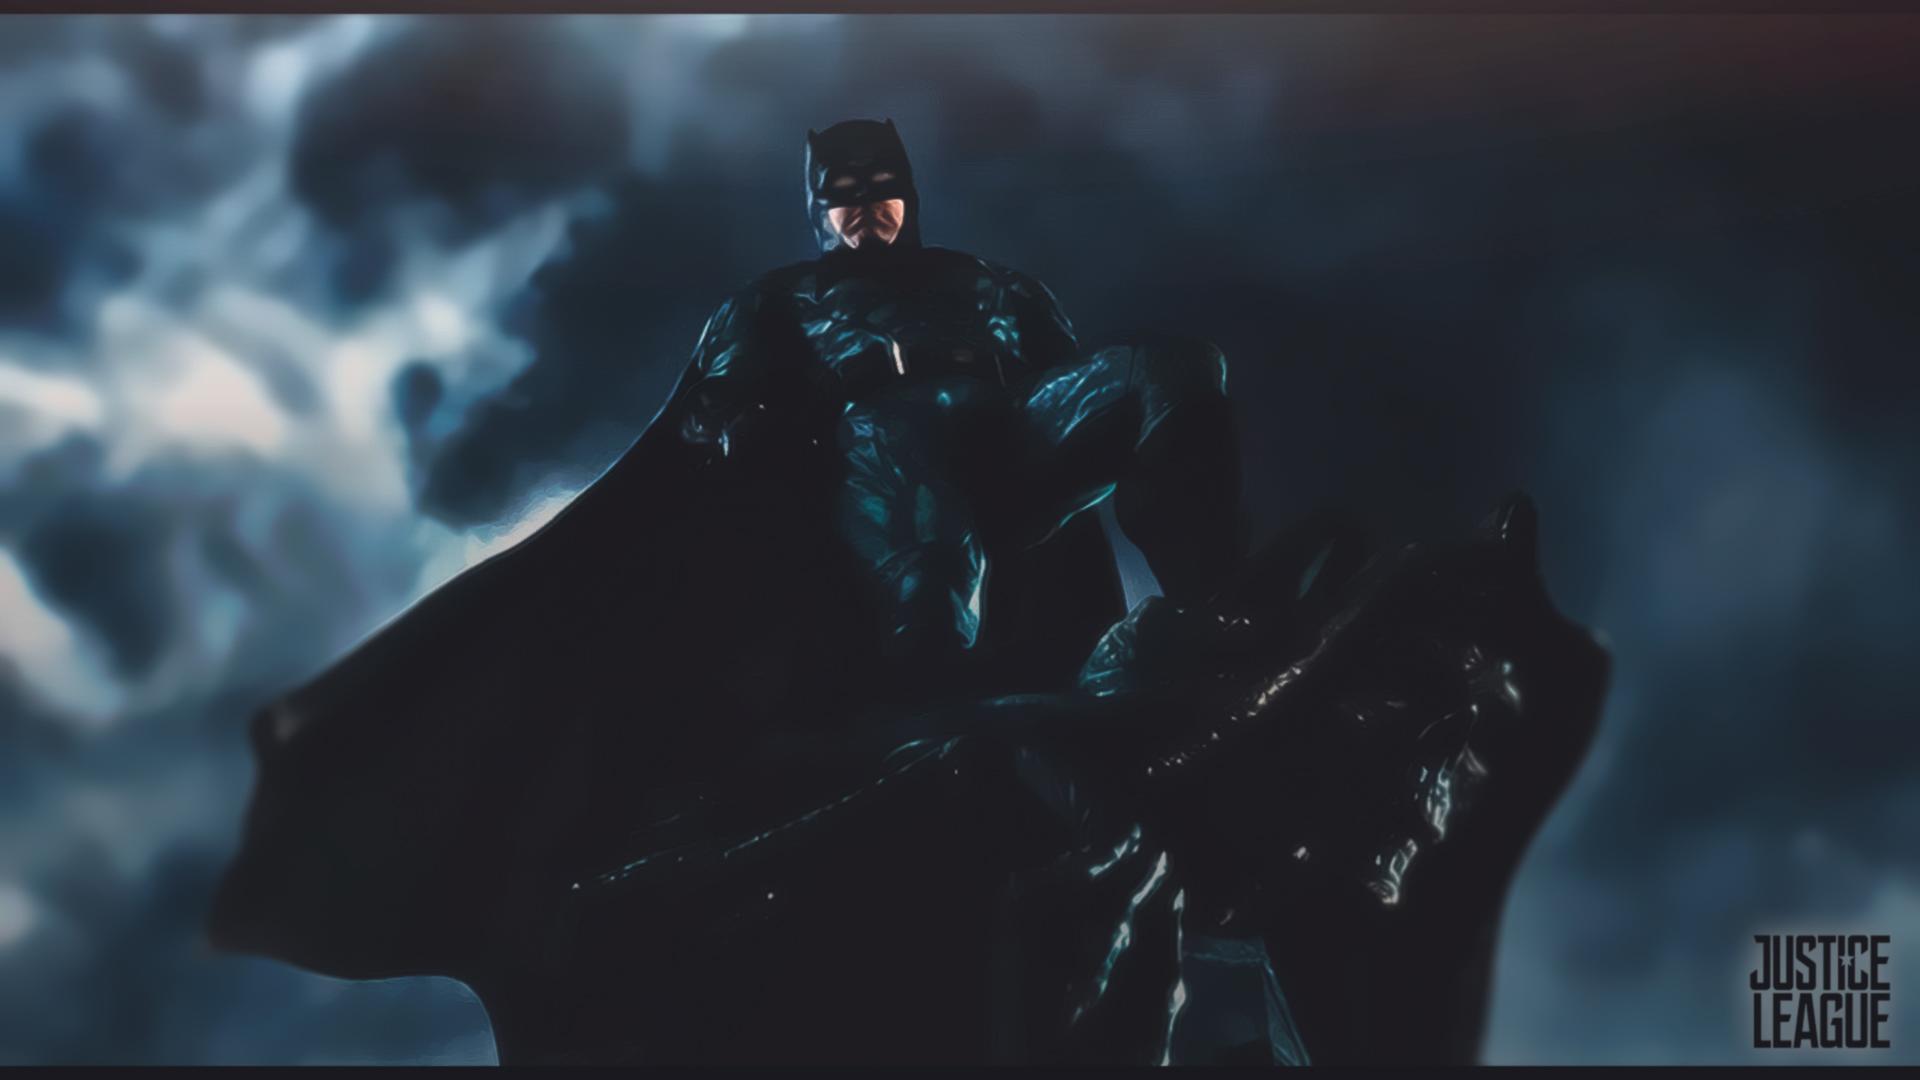 Wallpaper The Batman Justice League By 4n4rkyx On Deviantart